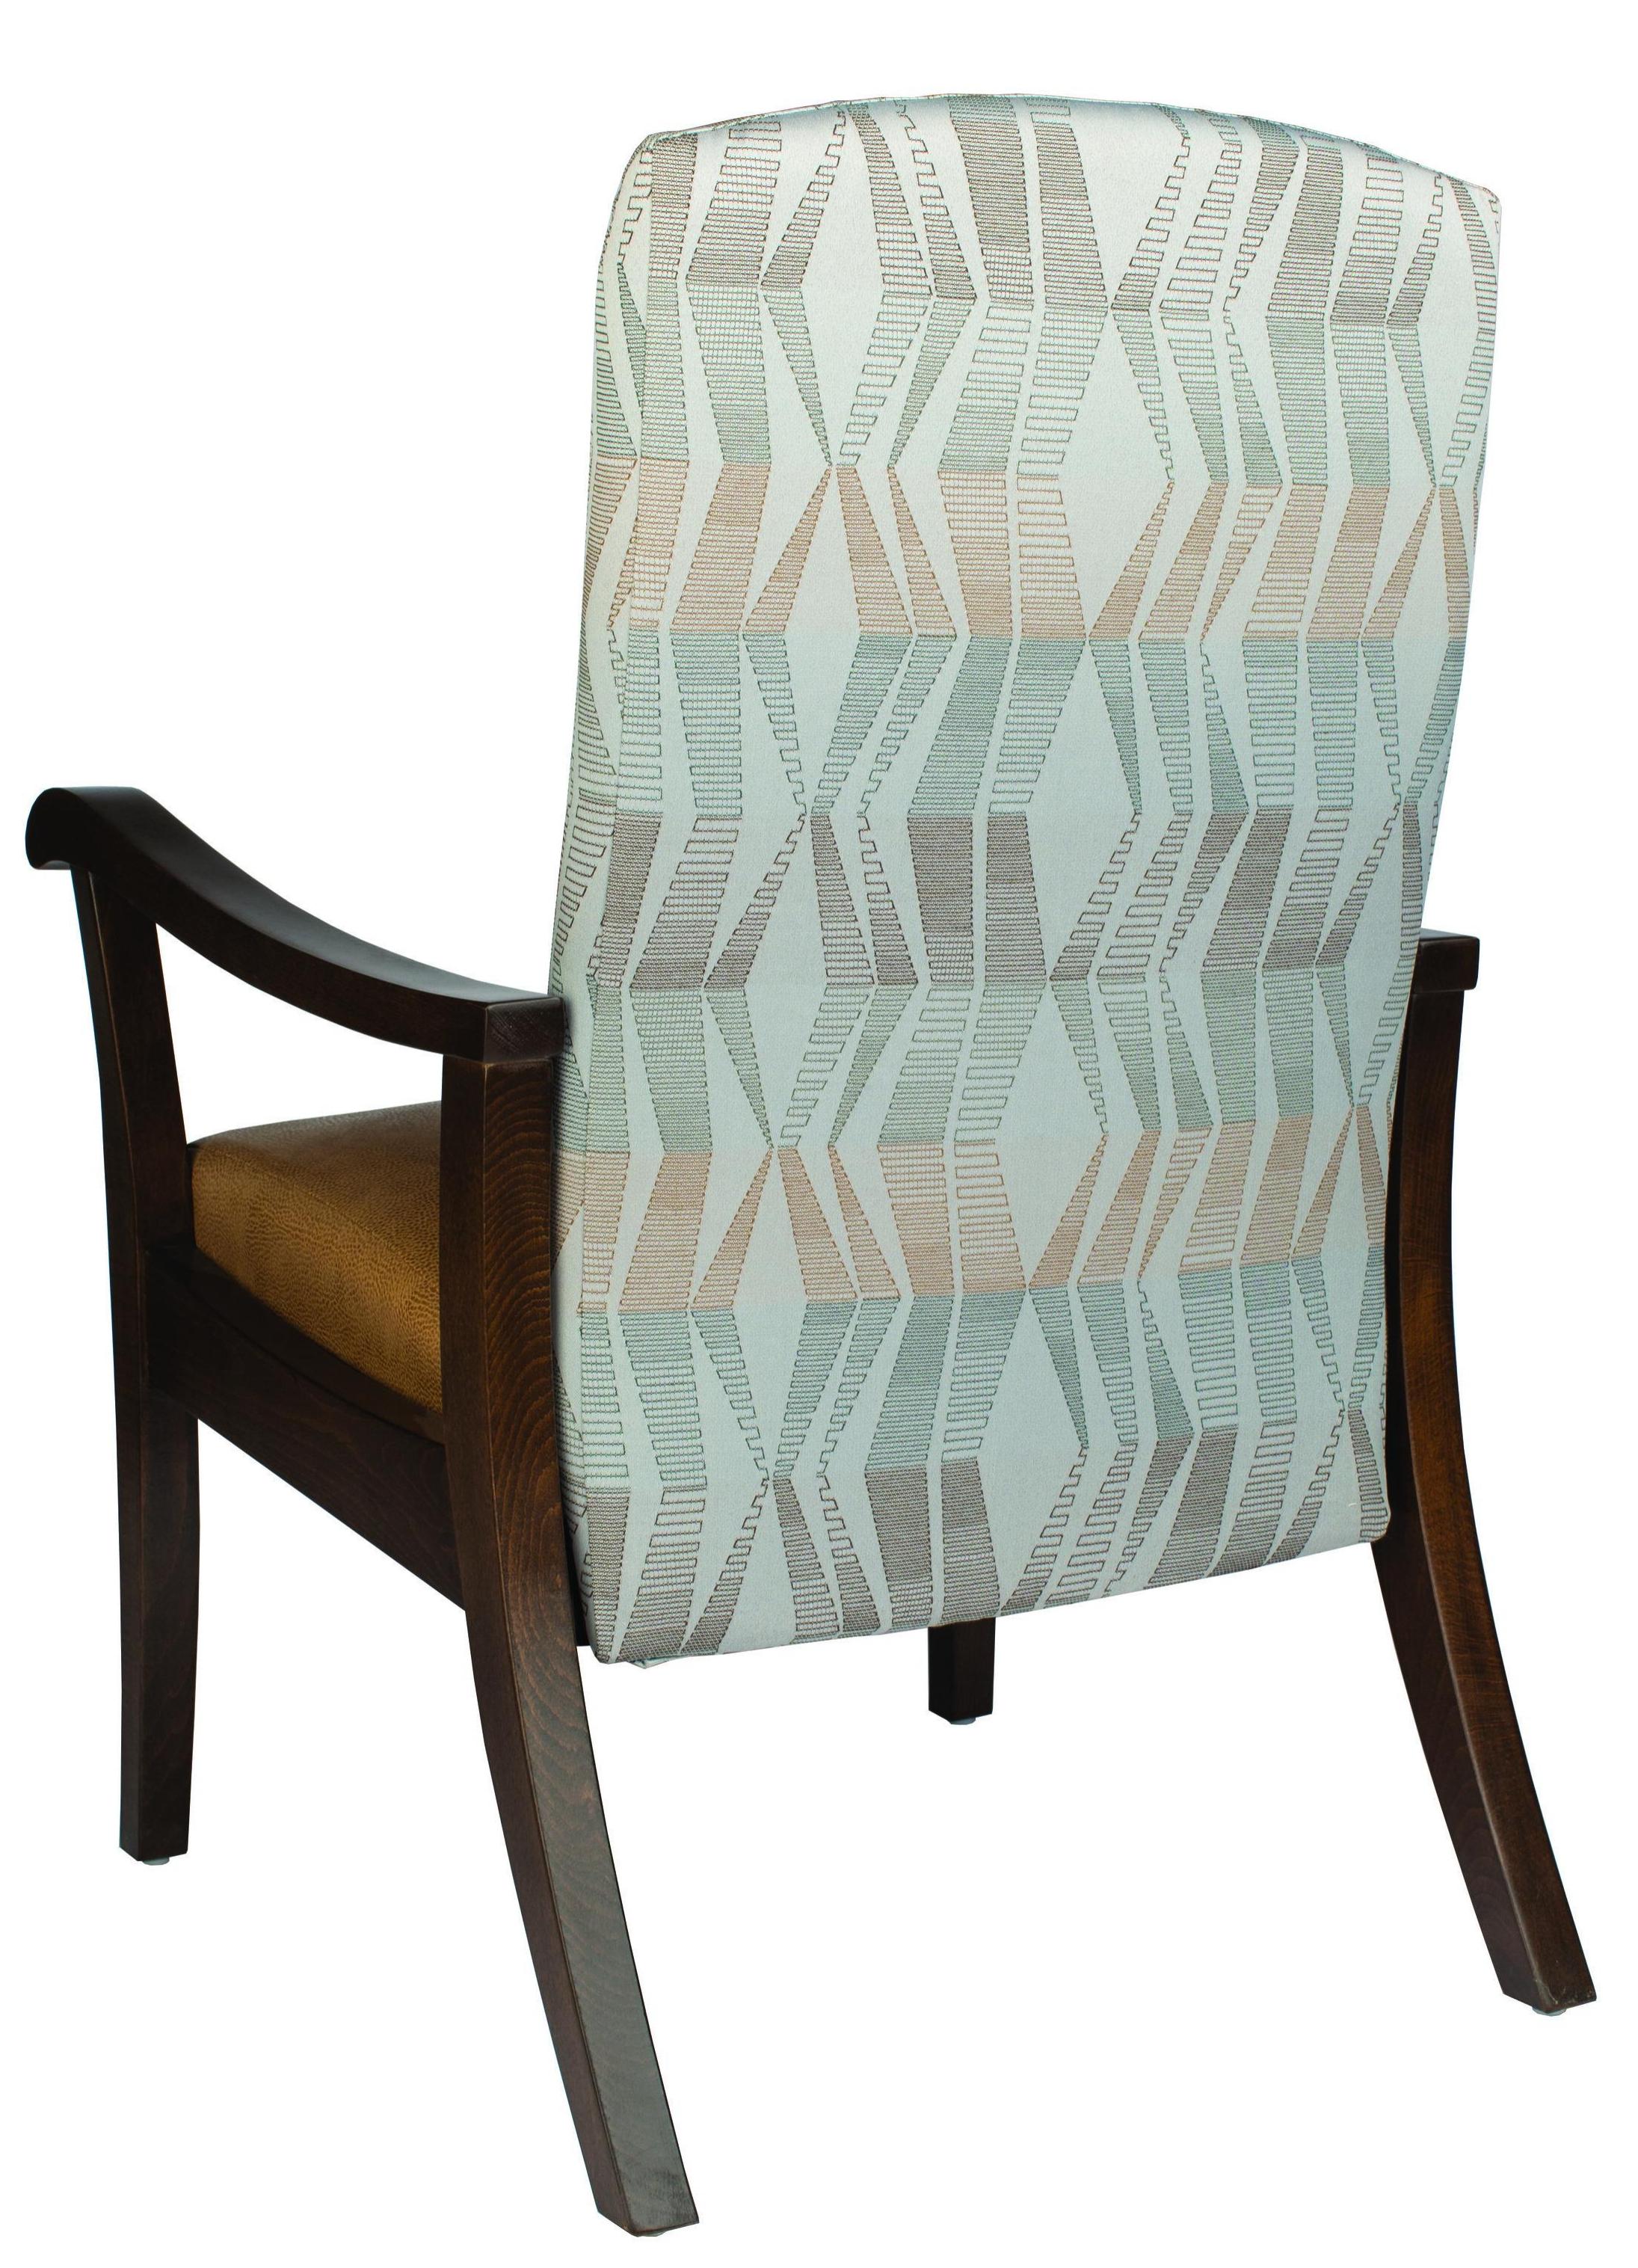 Kensington_Room_Chair_-_Rocker,_671-TCL,_Back_Jennis_Stellar_Lithium_902,_Seat_Jennis_Amarillo_6010_Moccasin_(back).jpg